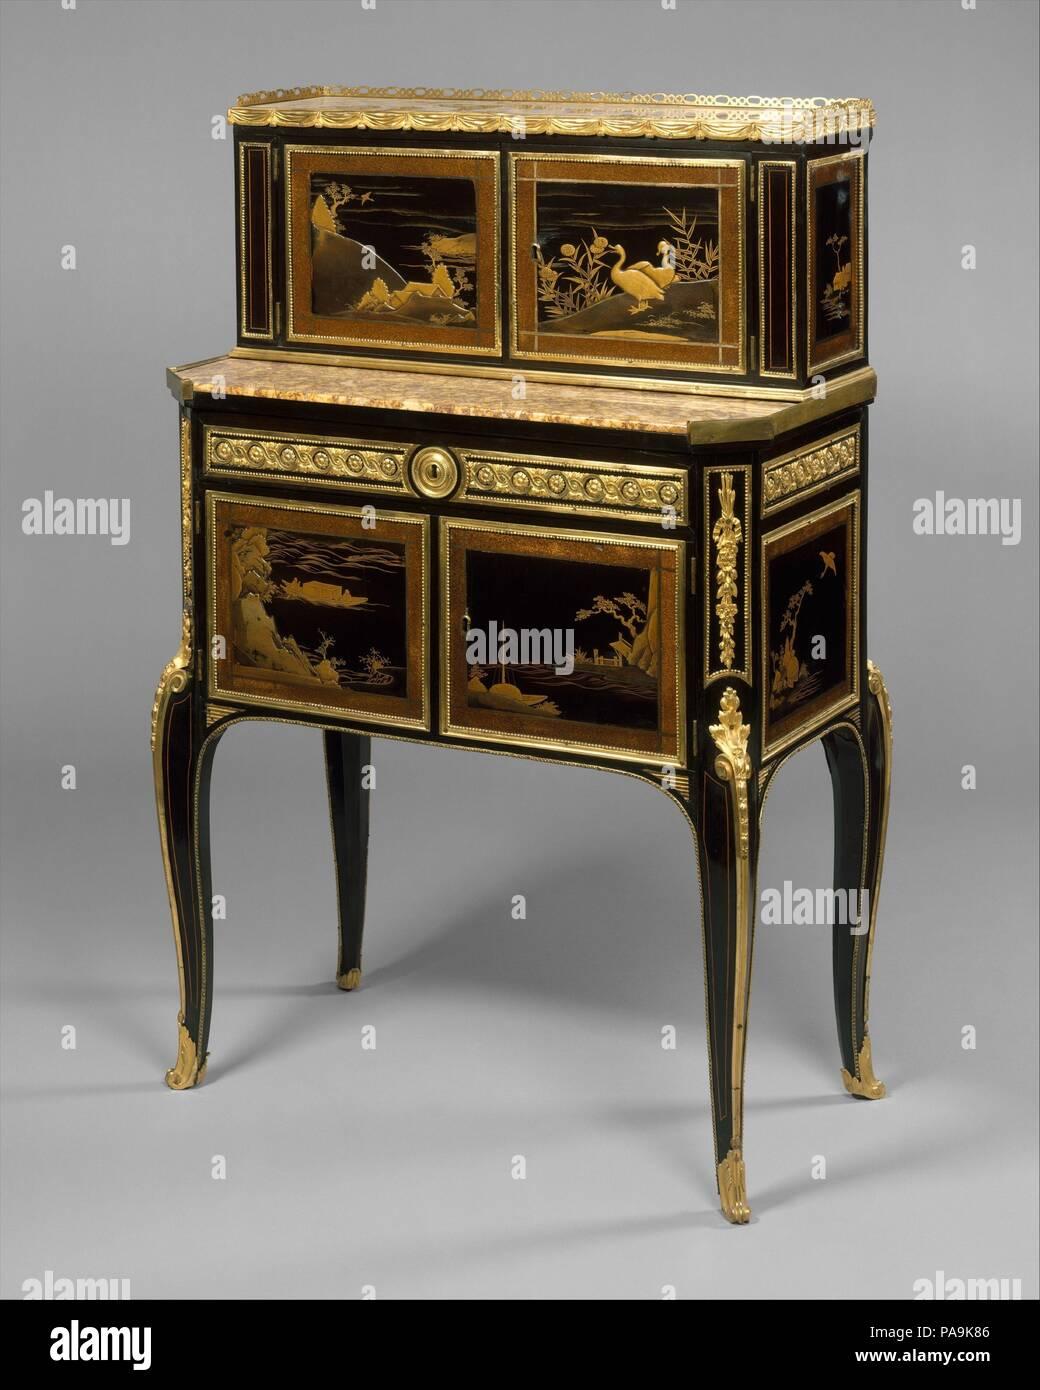 Desk (bonheur du jour). Culture: French. Dimensions: 39 x 25 1/4 x 14 1/2 in. (99.1 x 64.1 x 36.8cm). Maker: Claude-Charles Saunier (French, 1735-1807). Date: ca. 1765-75. Museum: Metropolitan Museum of Art, New York, USA. - Stock Image